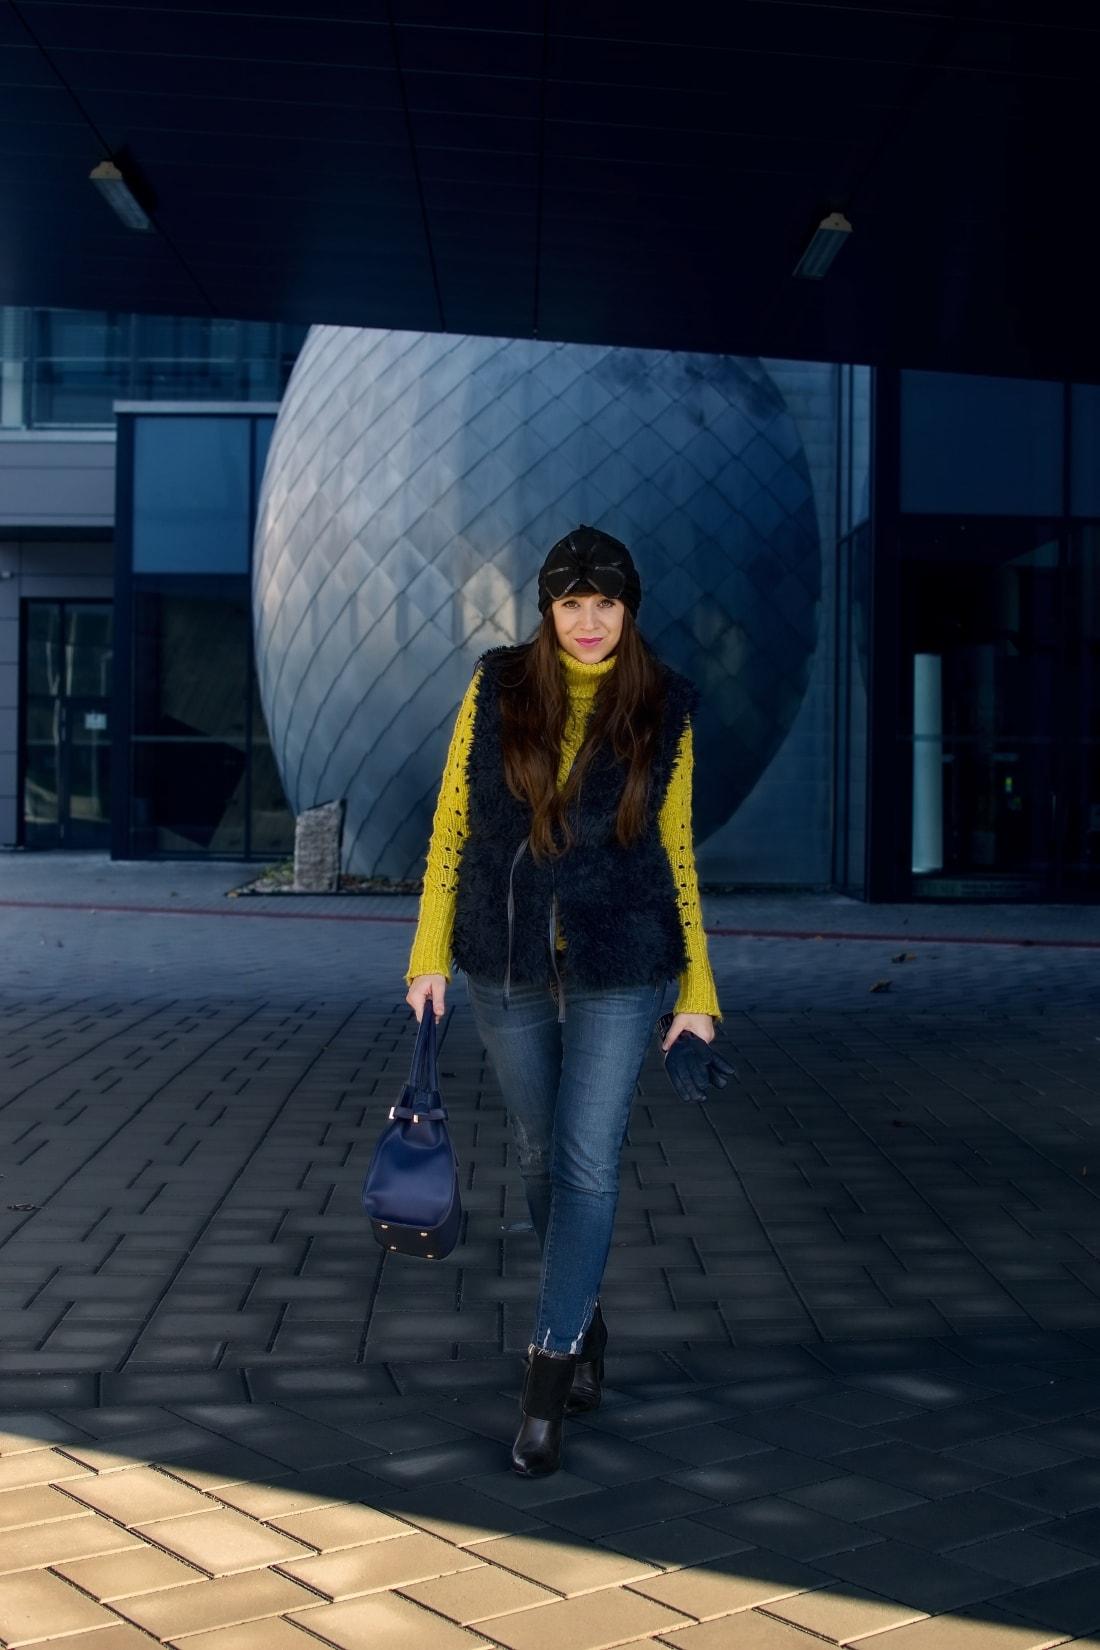 IRRESISTIBLE ME_Katharine-fashion is beautiful_blog 4_hair extension_irresistible me_beauty_Modrá kožušinová vesta_Katarína Jakubčová_Fashion blogger